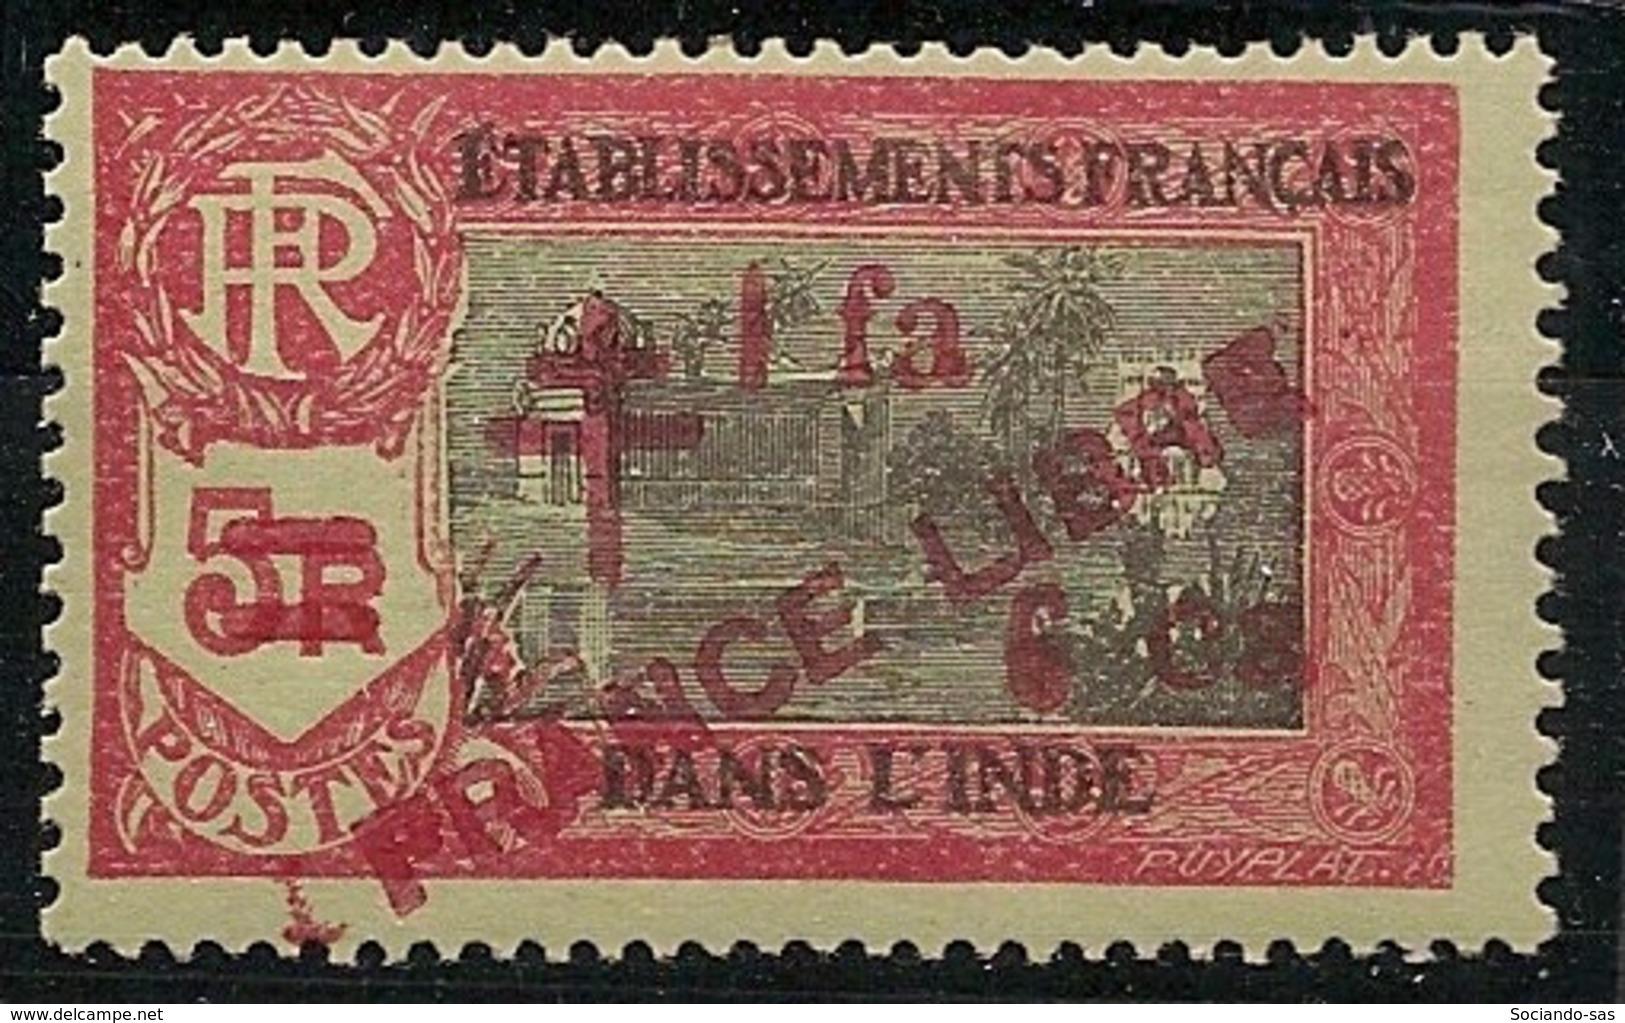 Inde - 1943 - N°Yv. 212b - Variété PRANCE Libre - Neuf Luxe ** / MNH / Postfrisch - Indien (1892-1954)